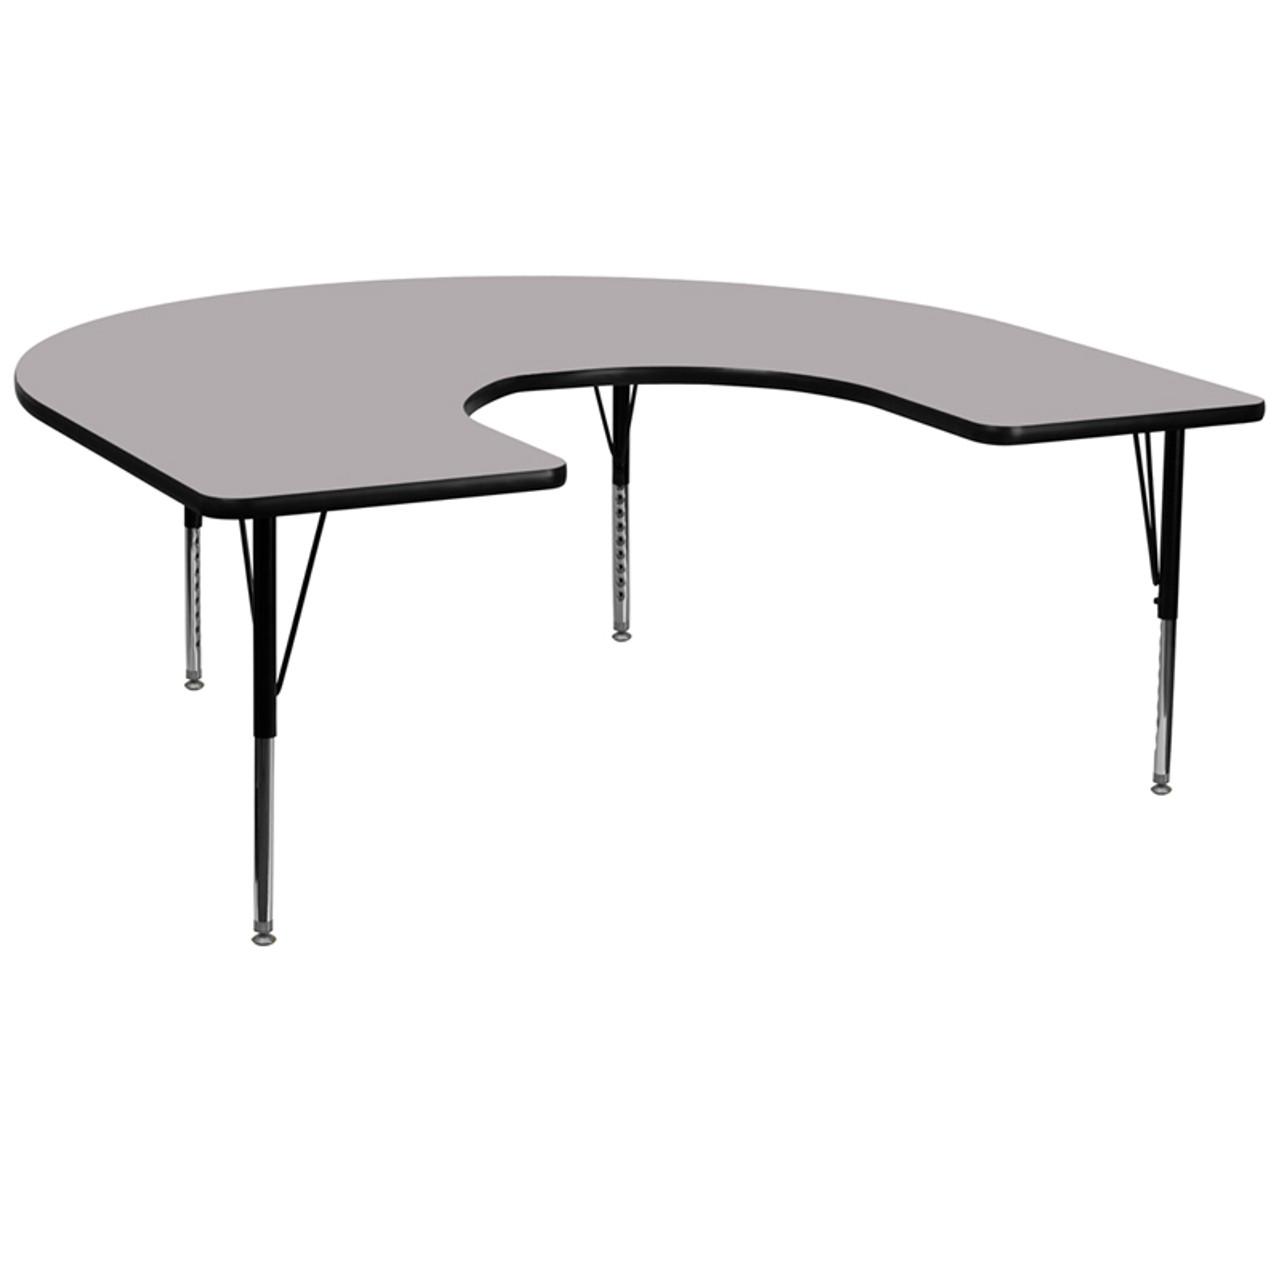 Horseshoe Activity Tables